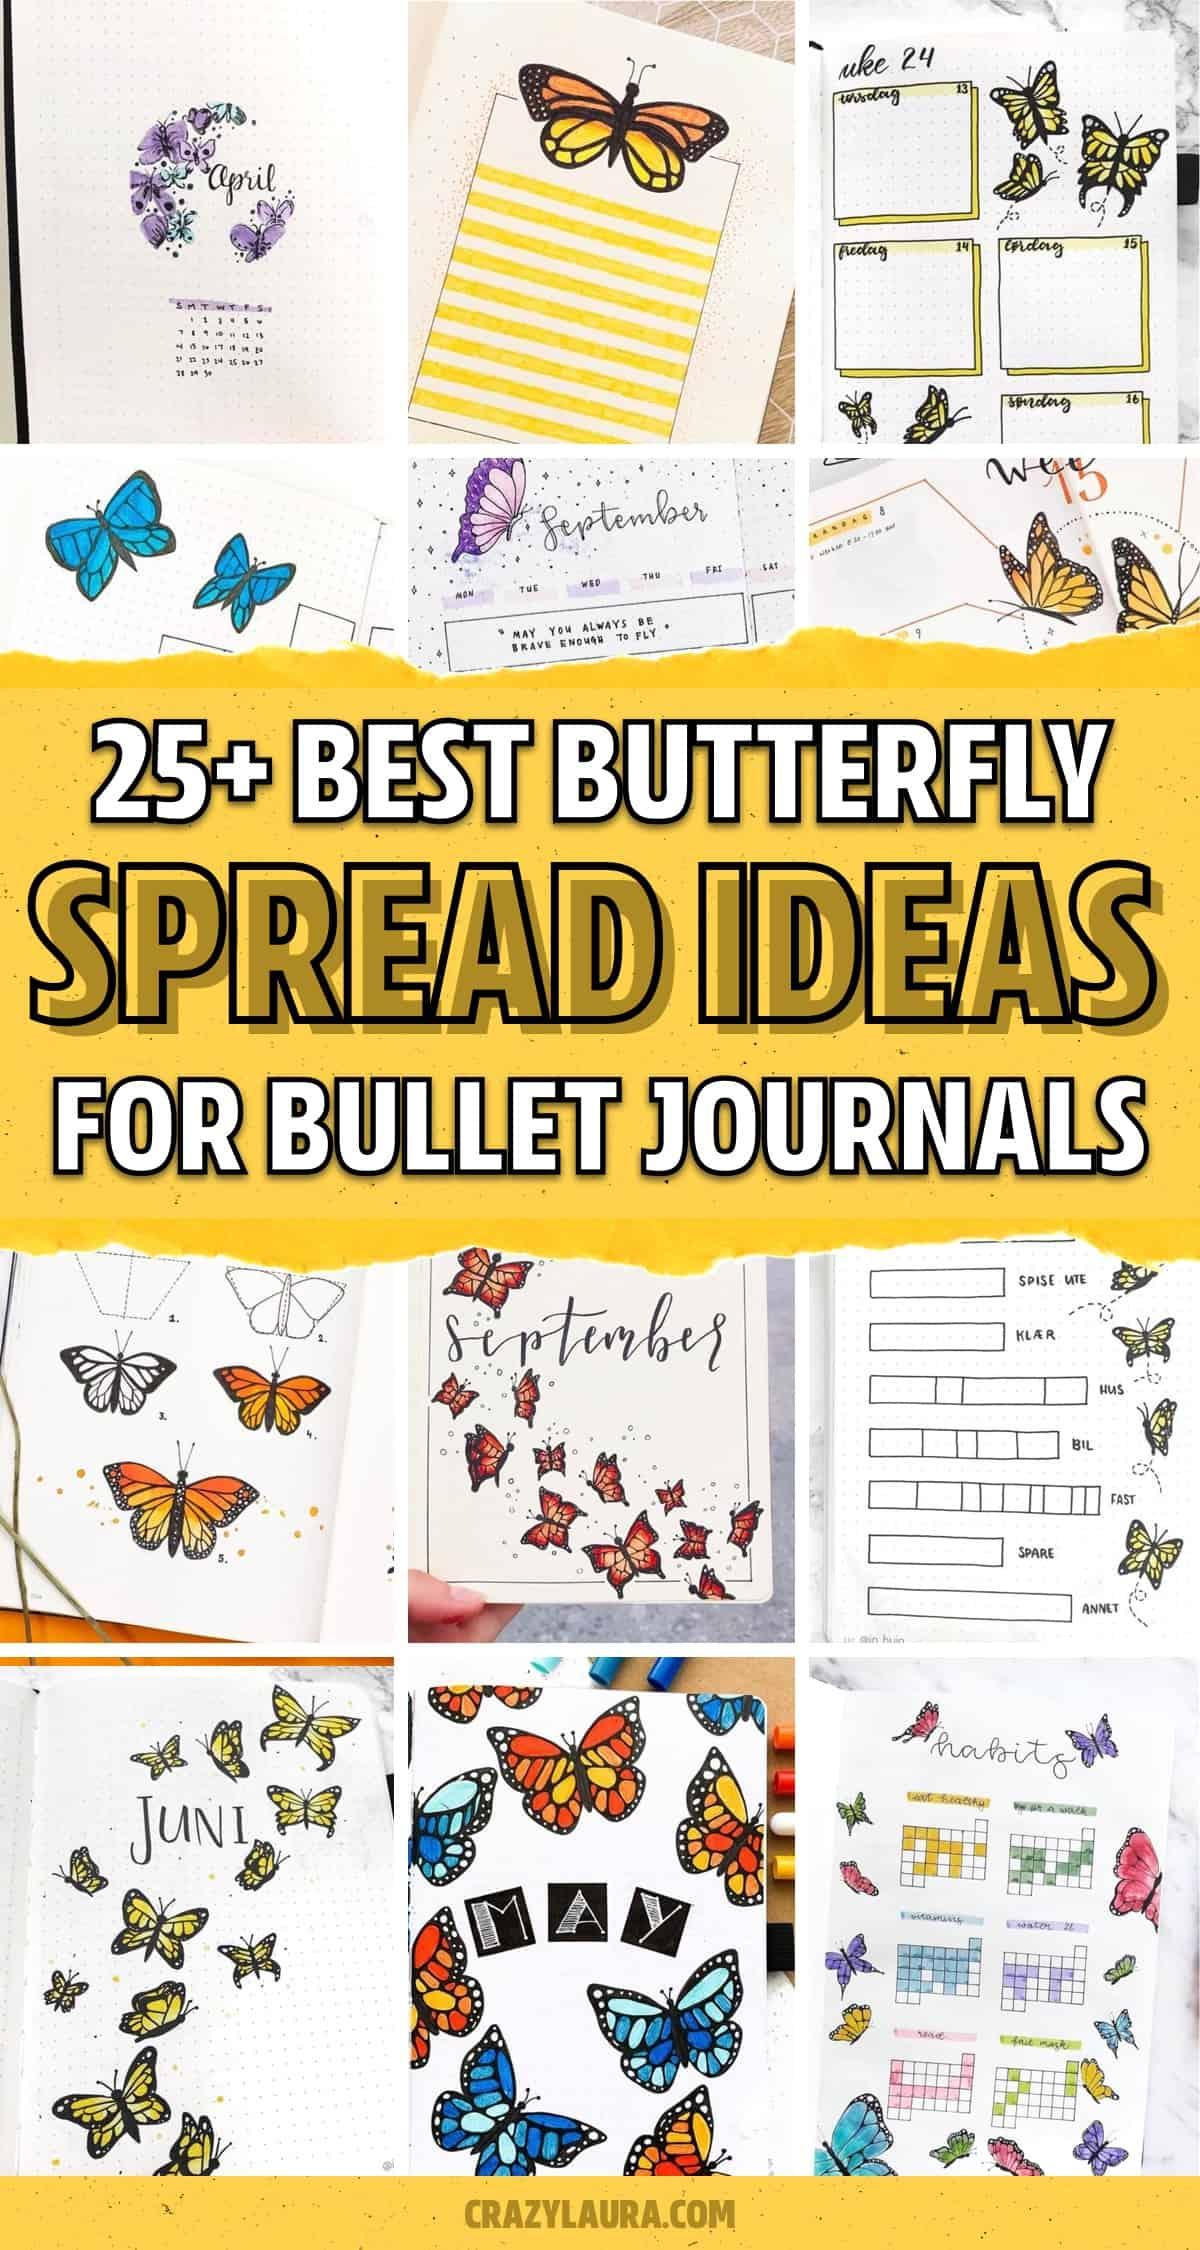 bujo spread ideas with butterfly theme